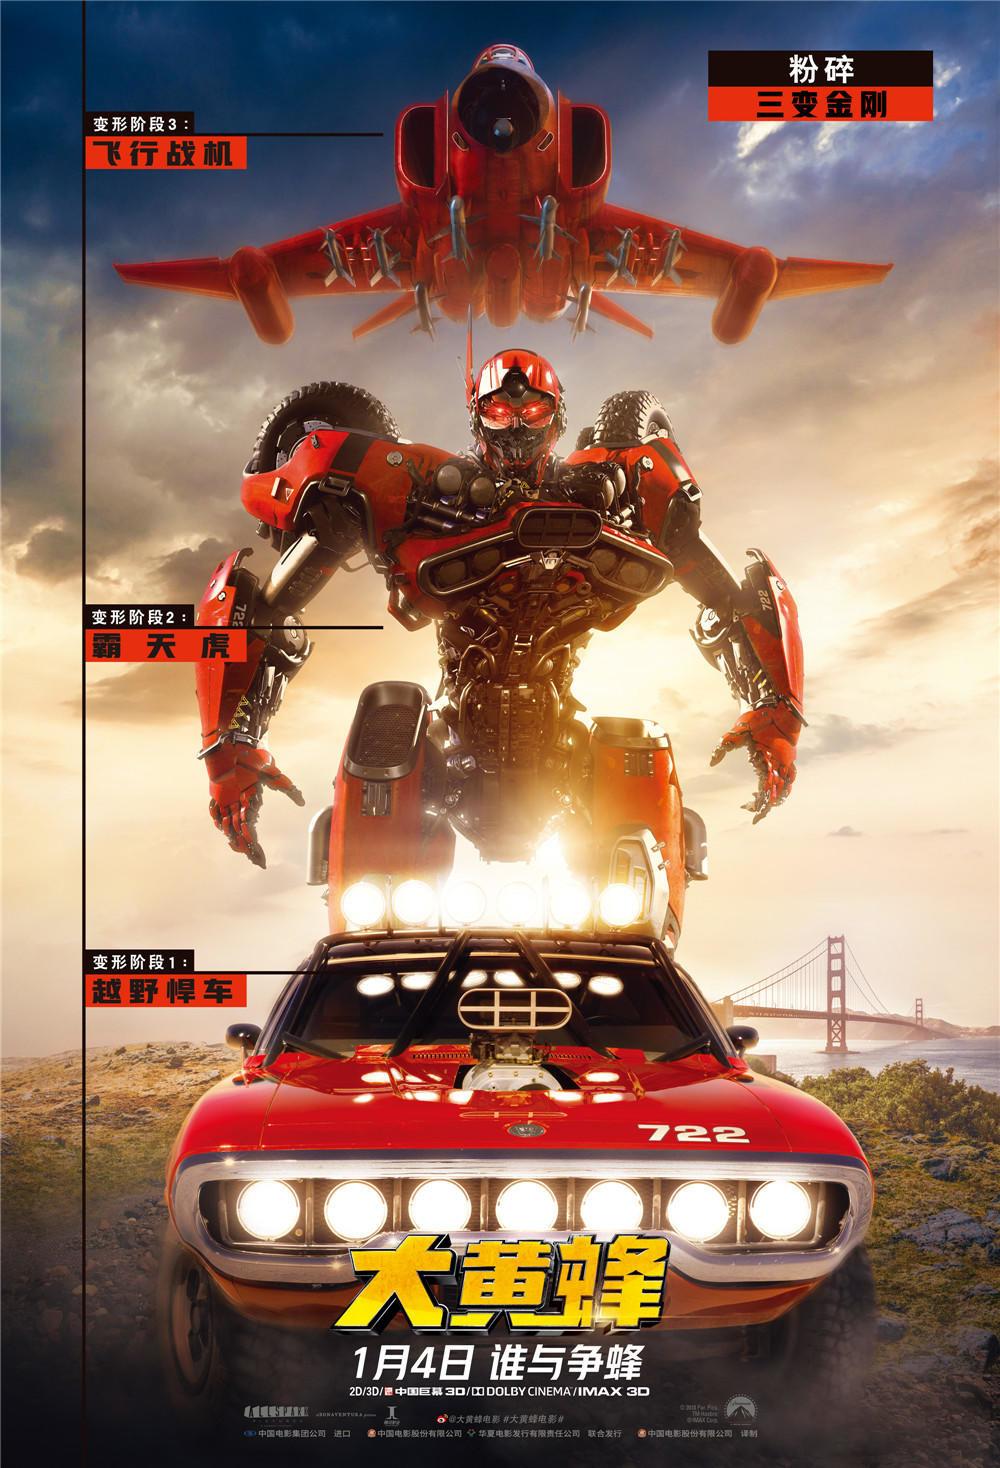 bumblebee dvd release date redbox netflix itunes amazon